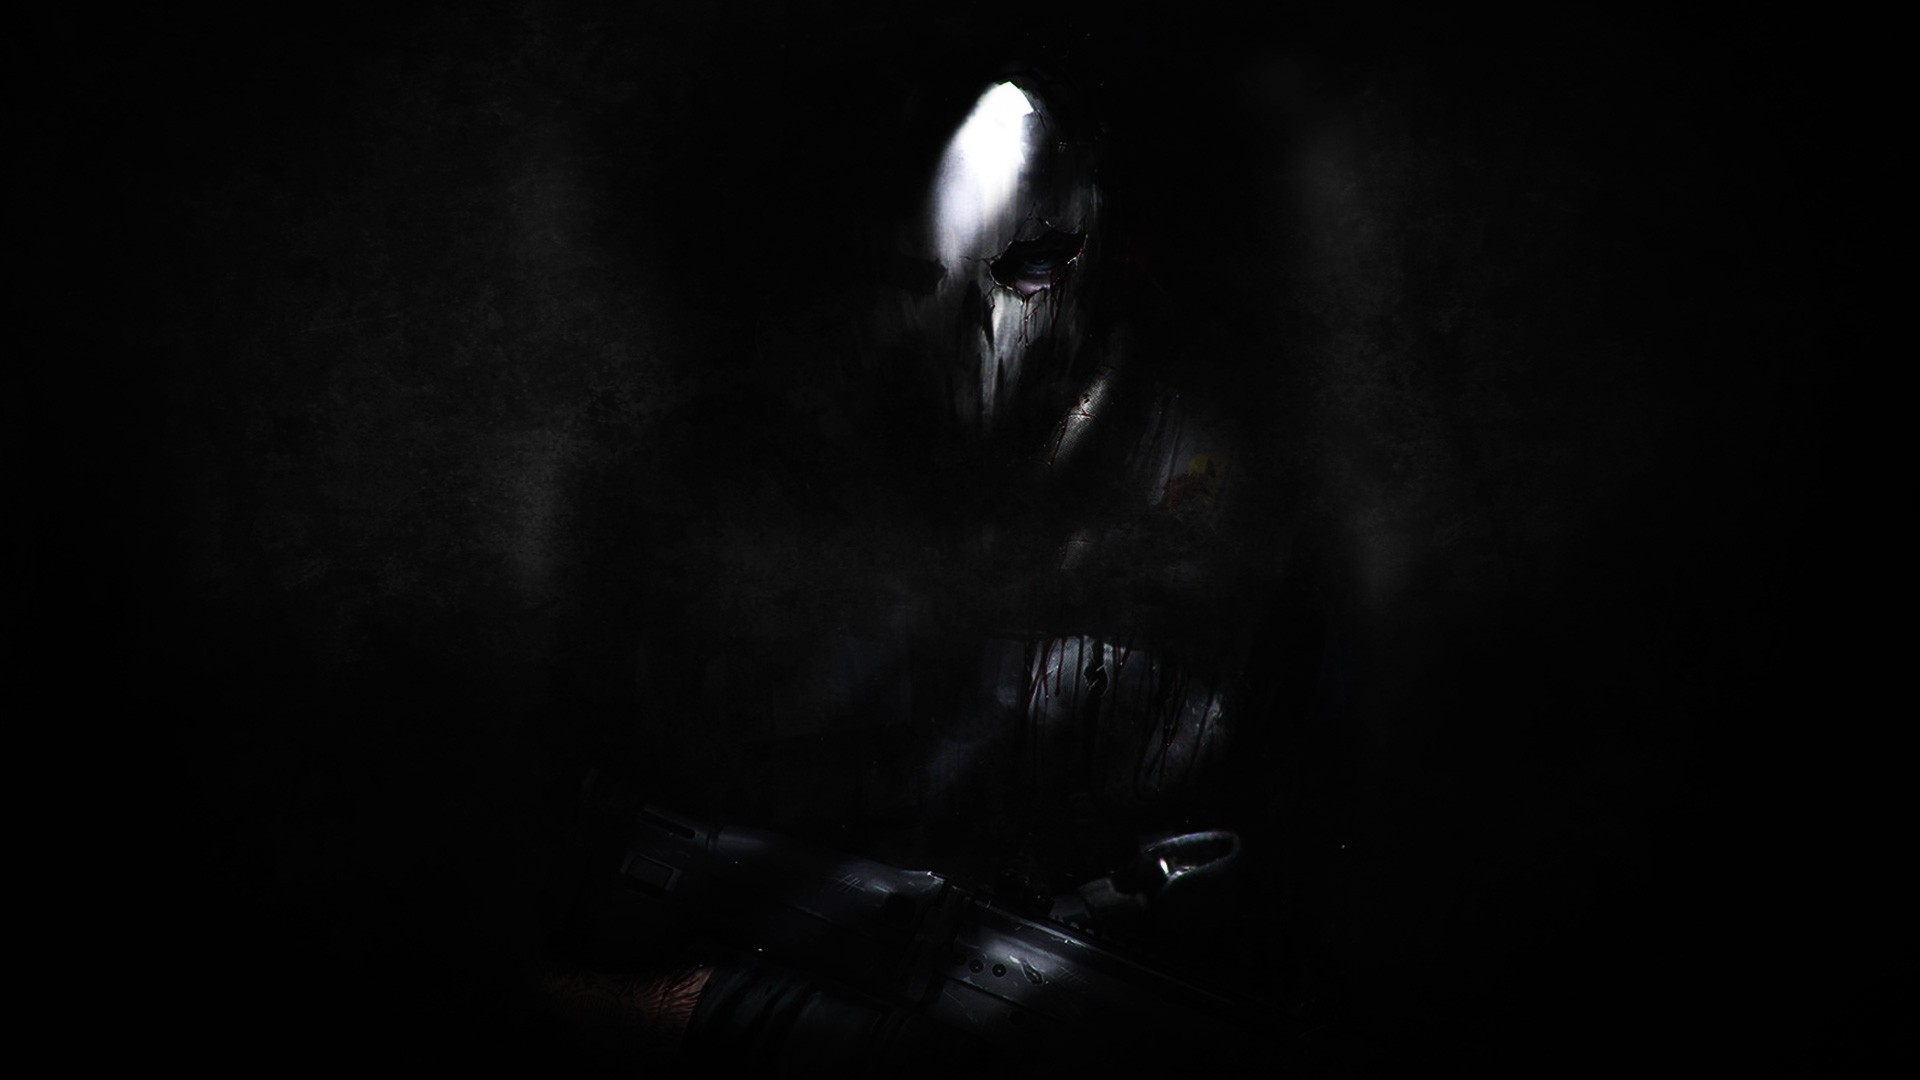 Ghost Wallpaper ·① Download Free Beautiful Full HD